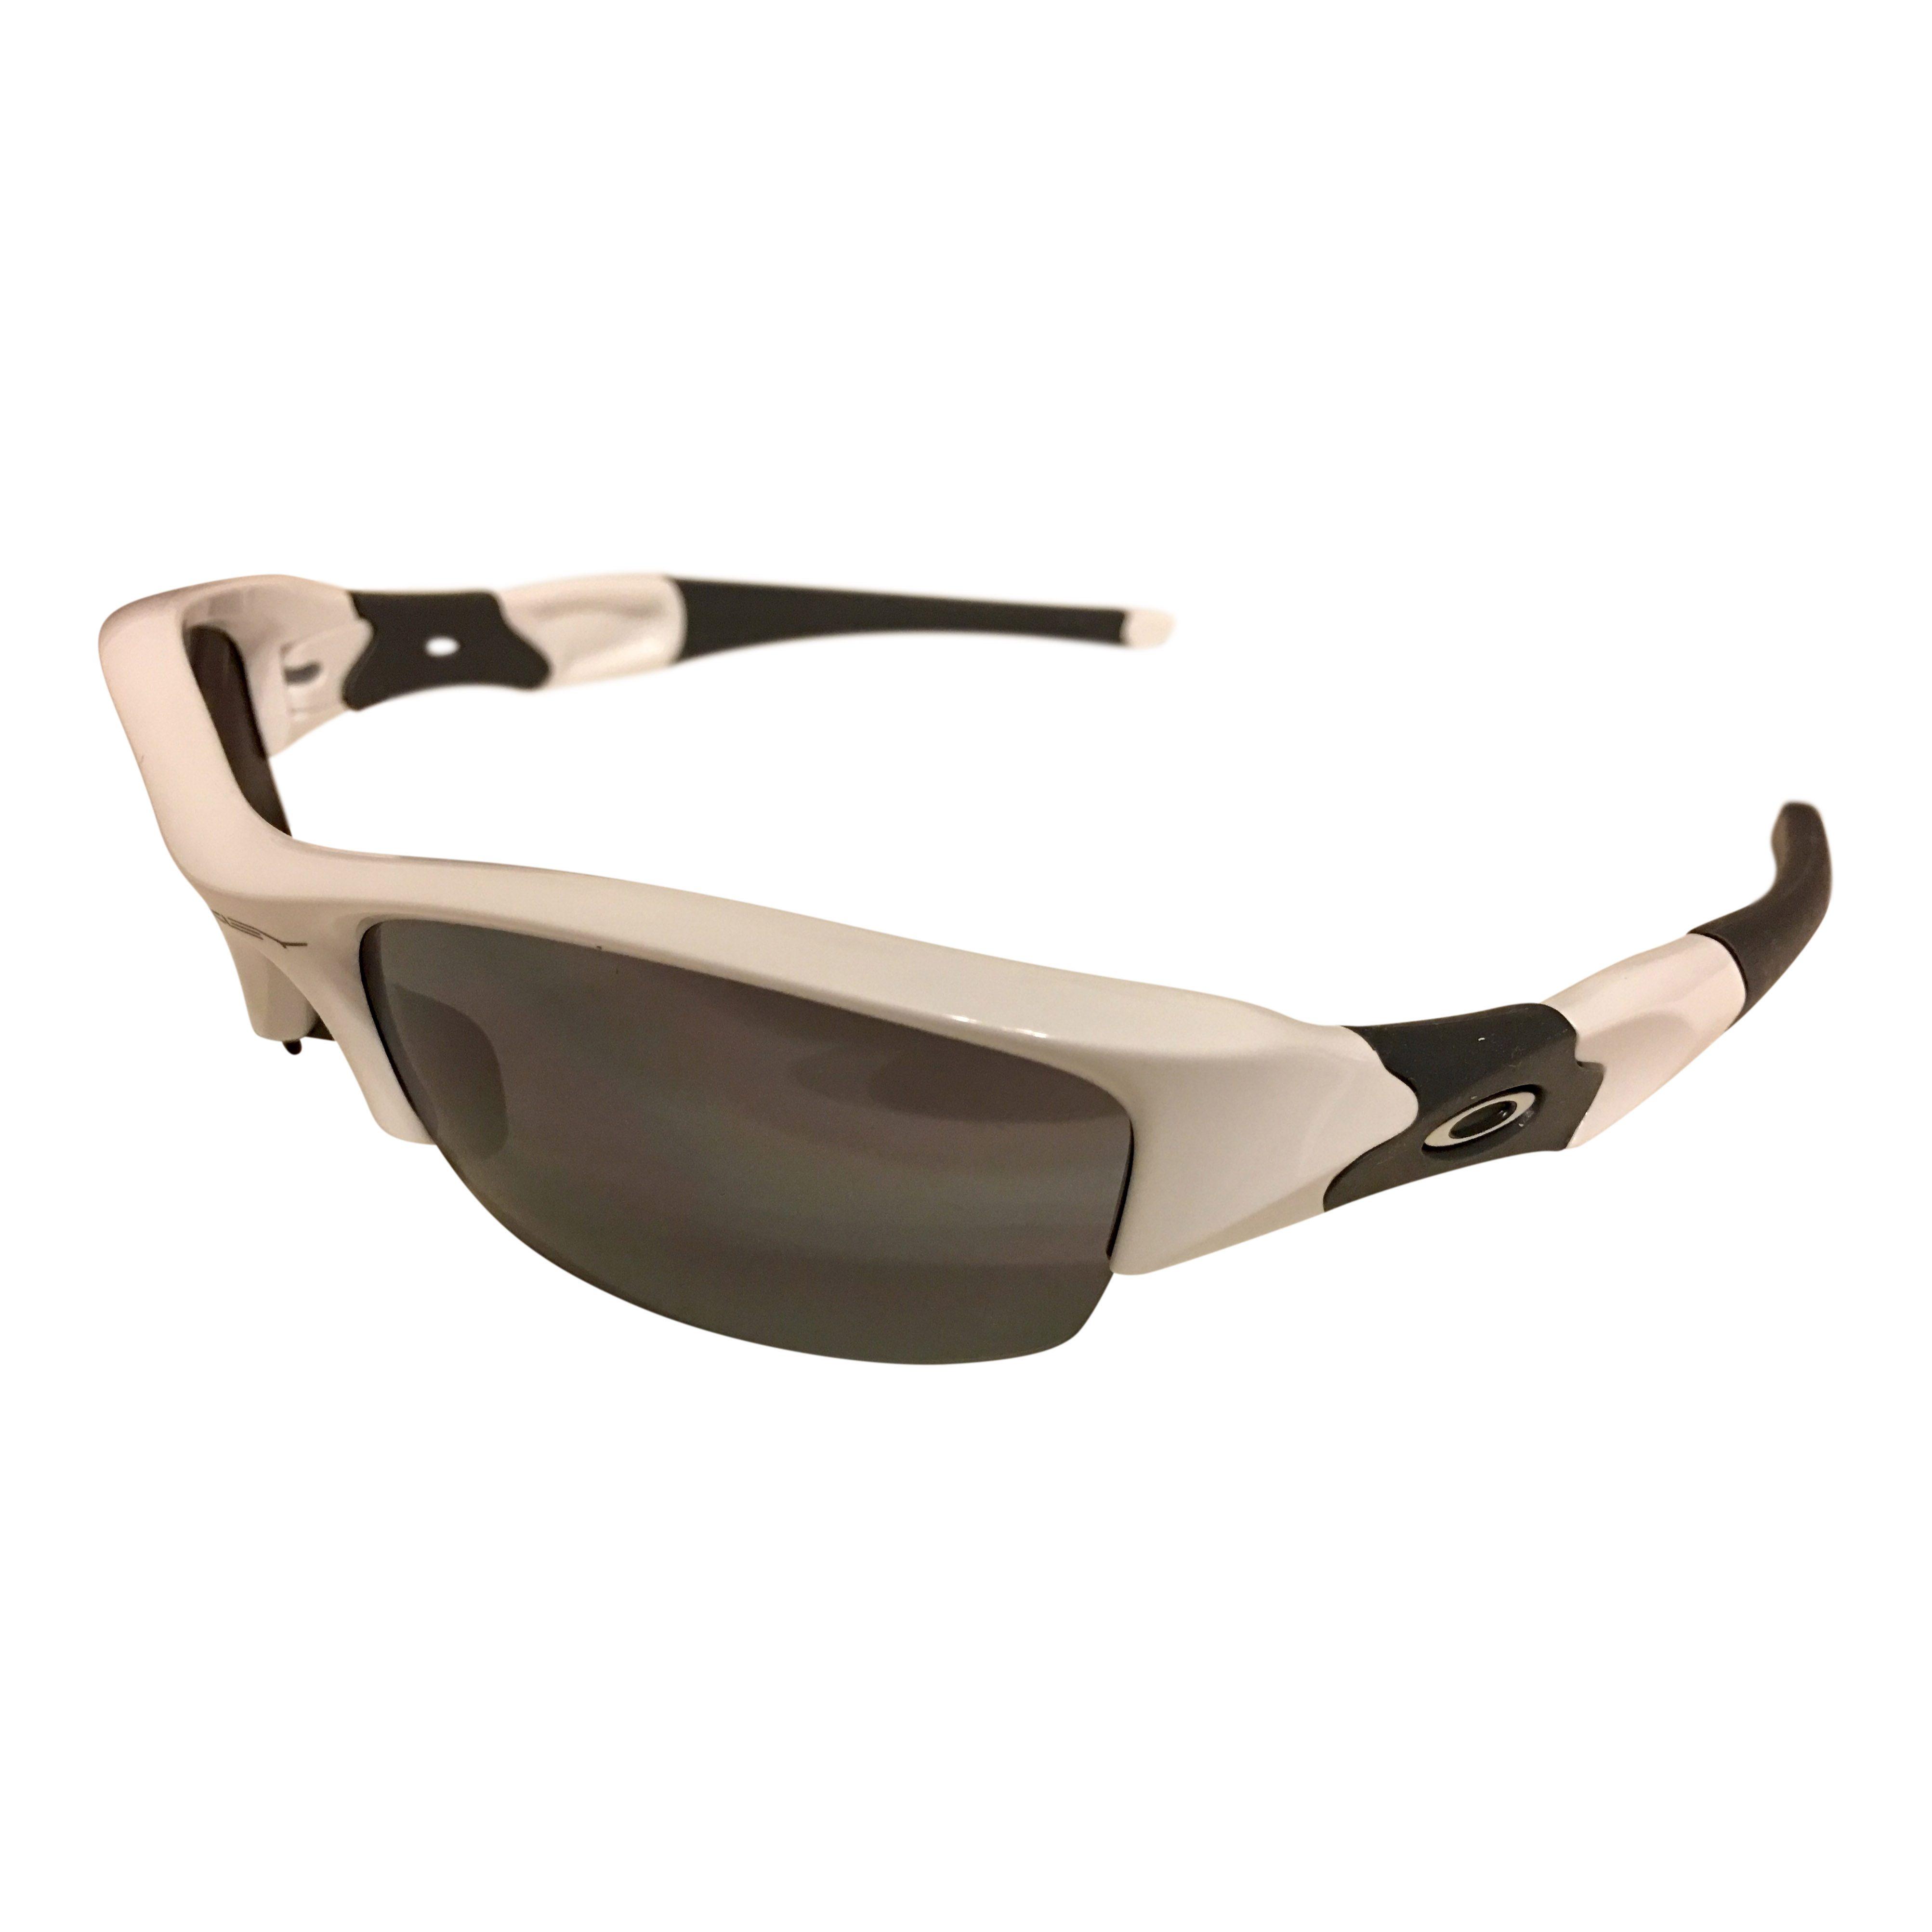 d1cfe2735b30c inexpensive oakley flak jacket sunglasses polished white frame black  iridium 03 882 a54f6 78676